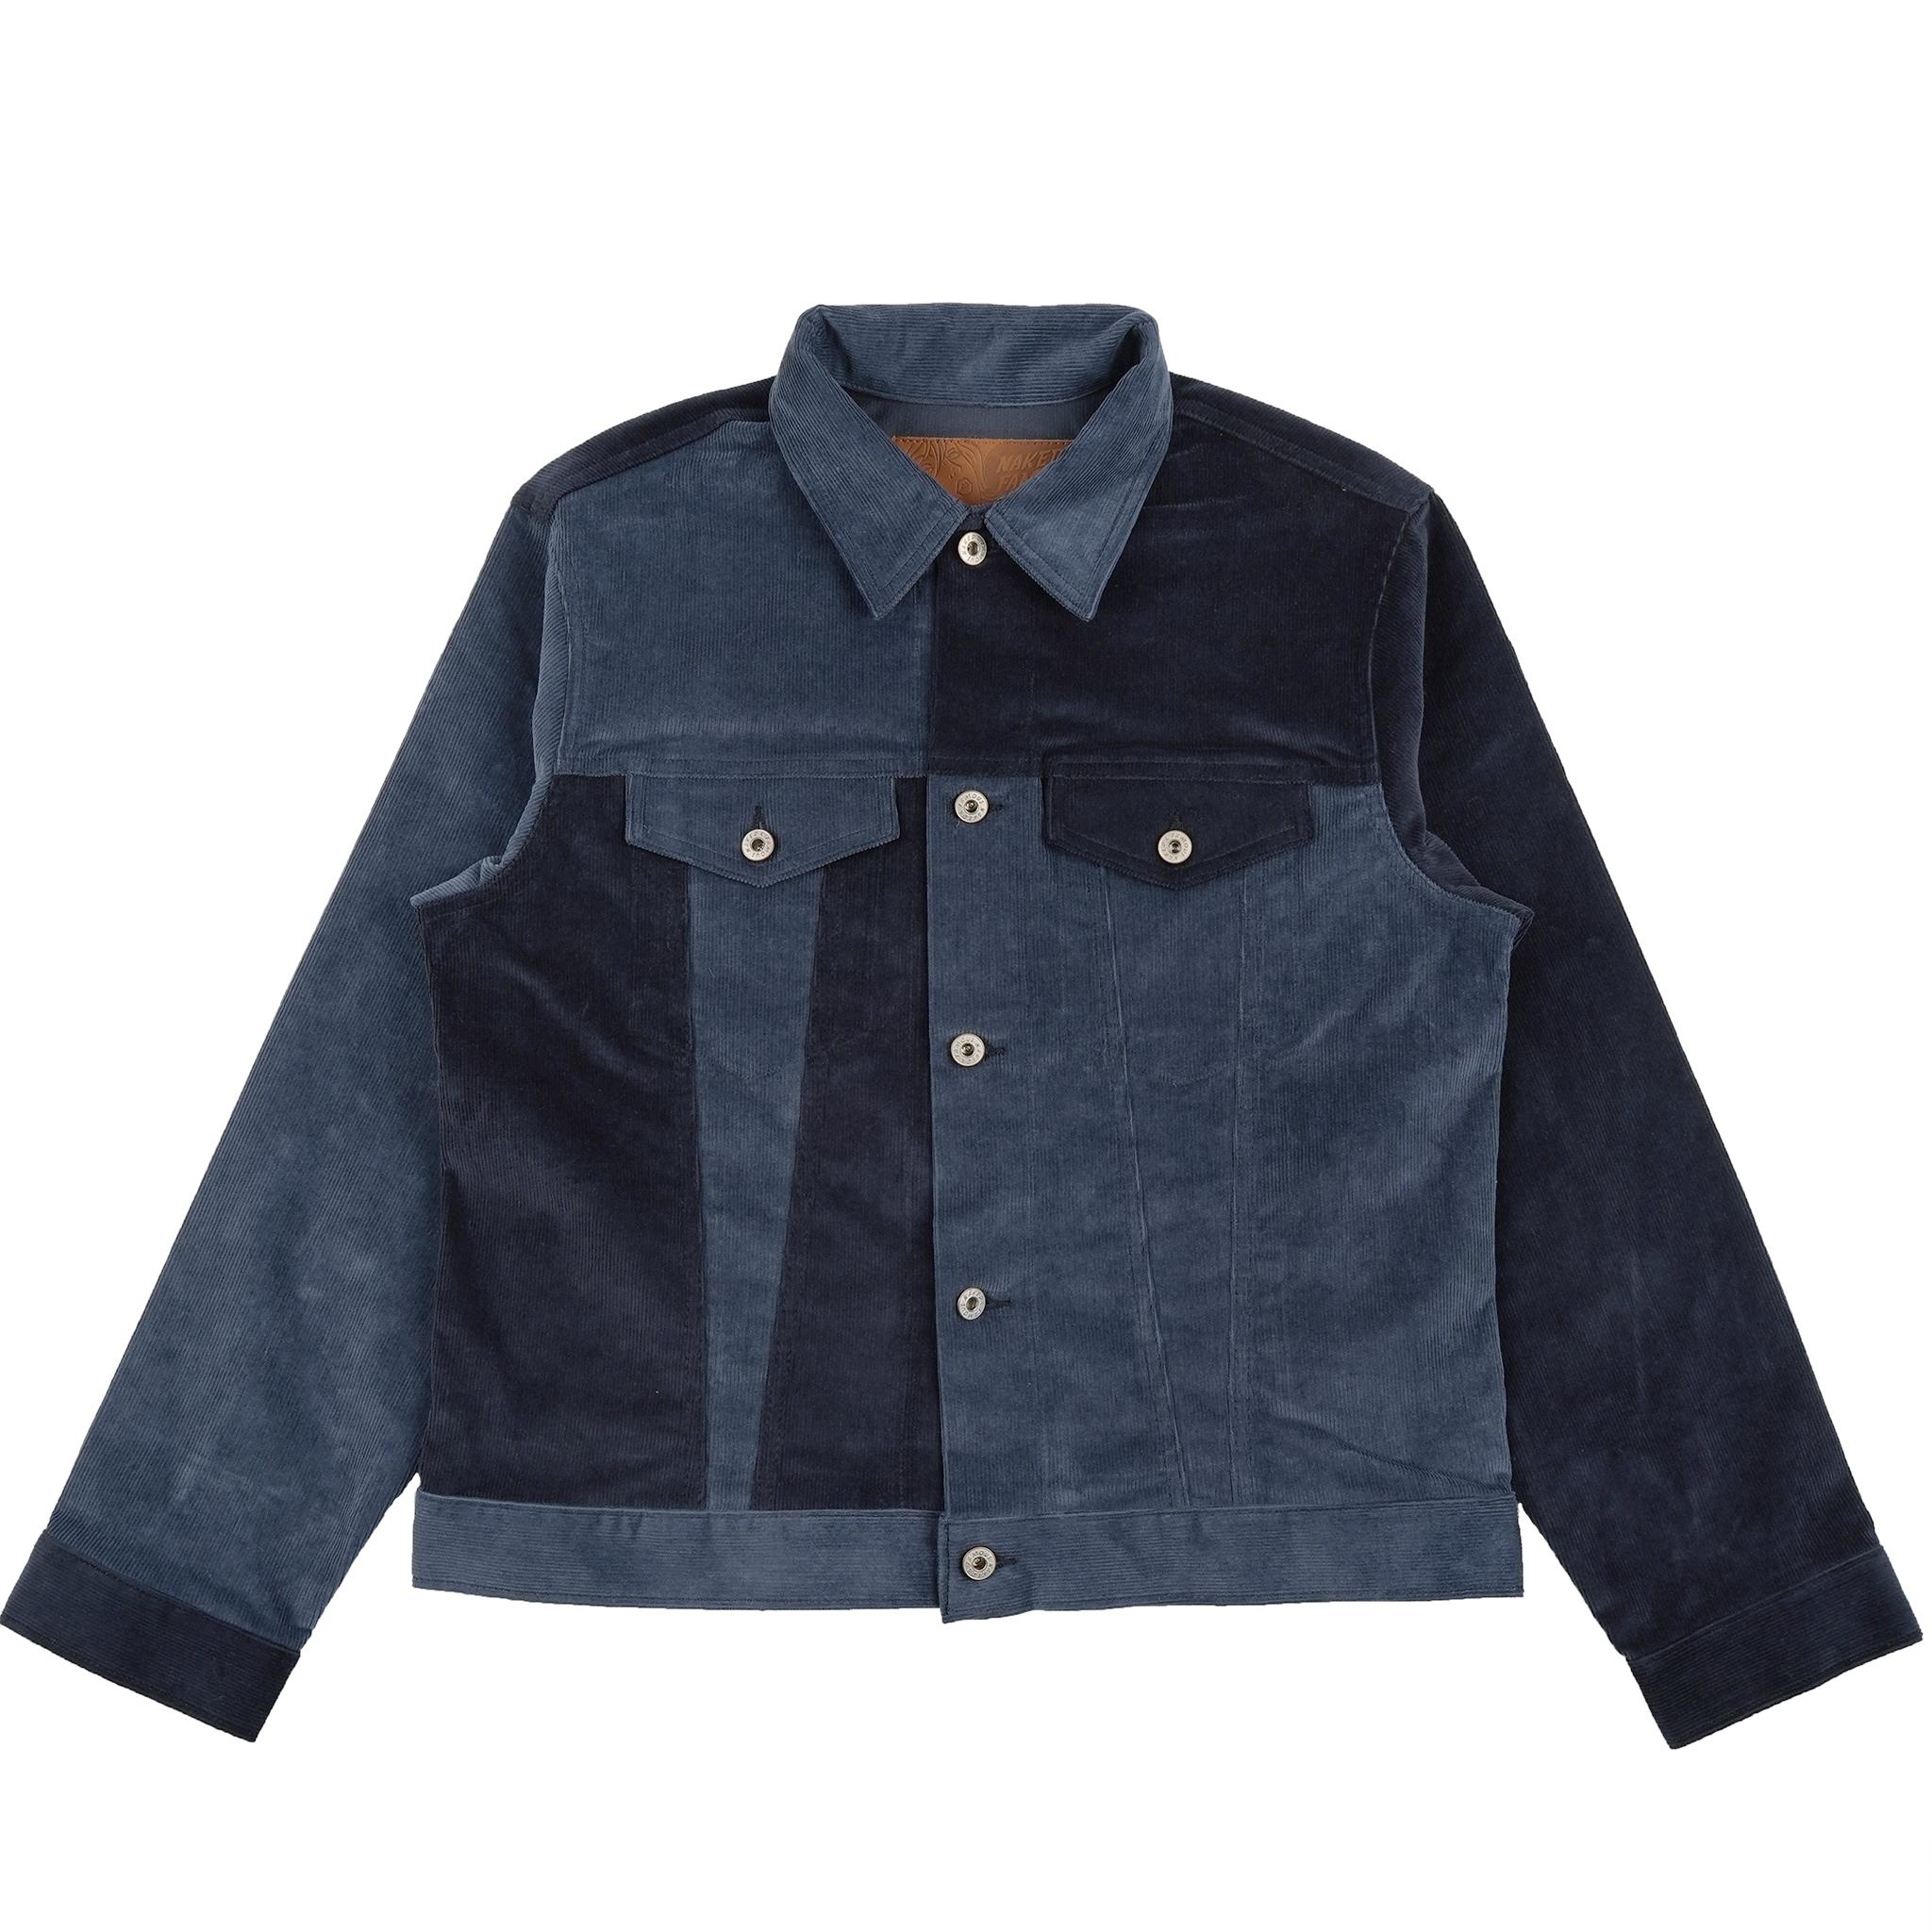 Indigo Colorblock Corduroy - Denim Jacket